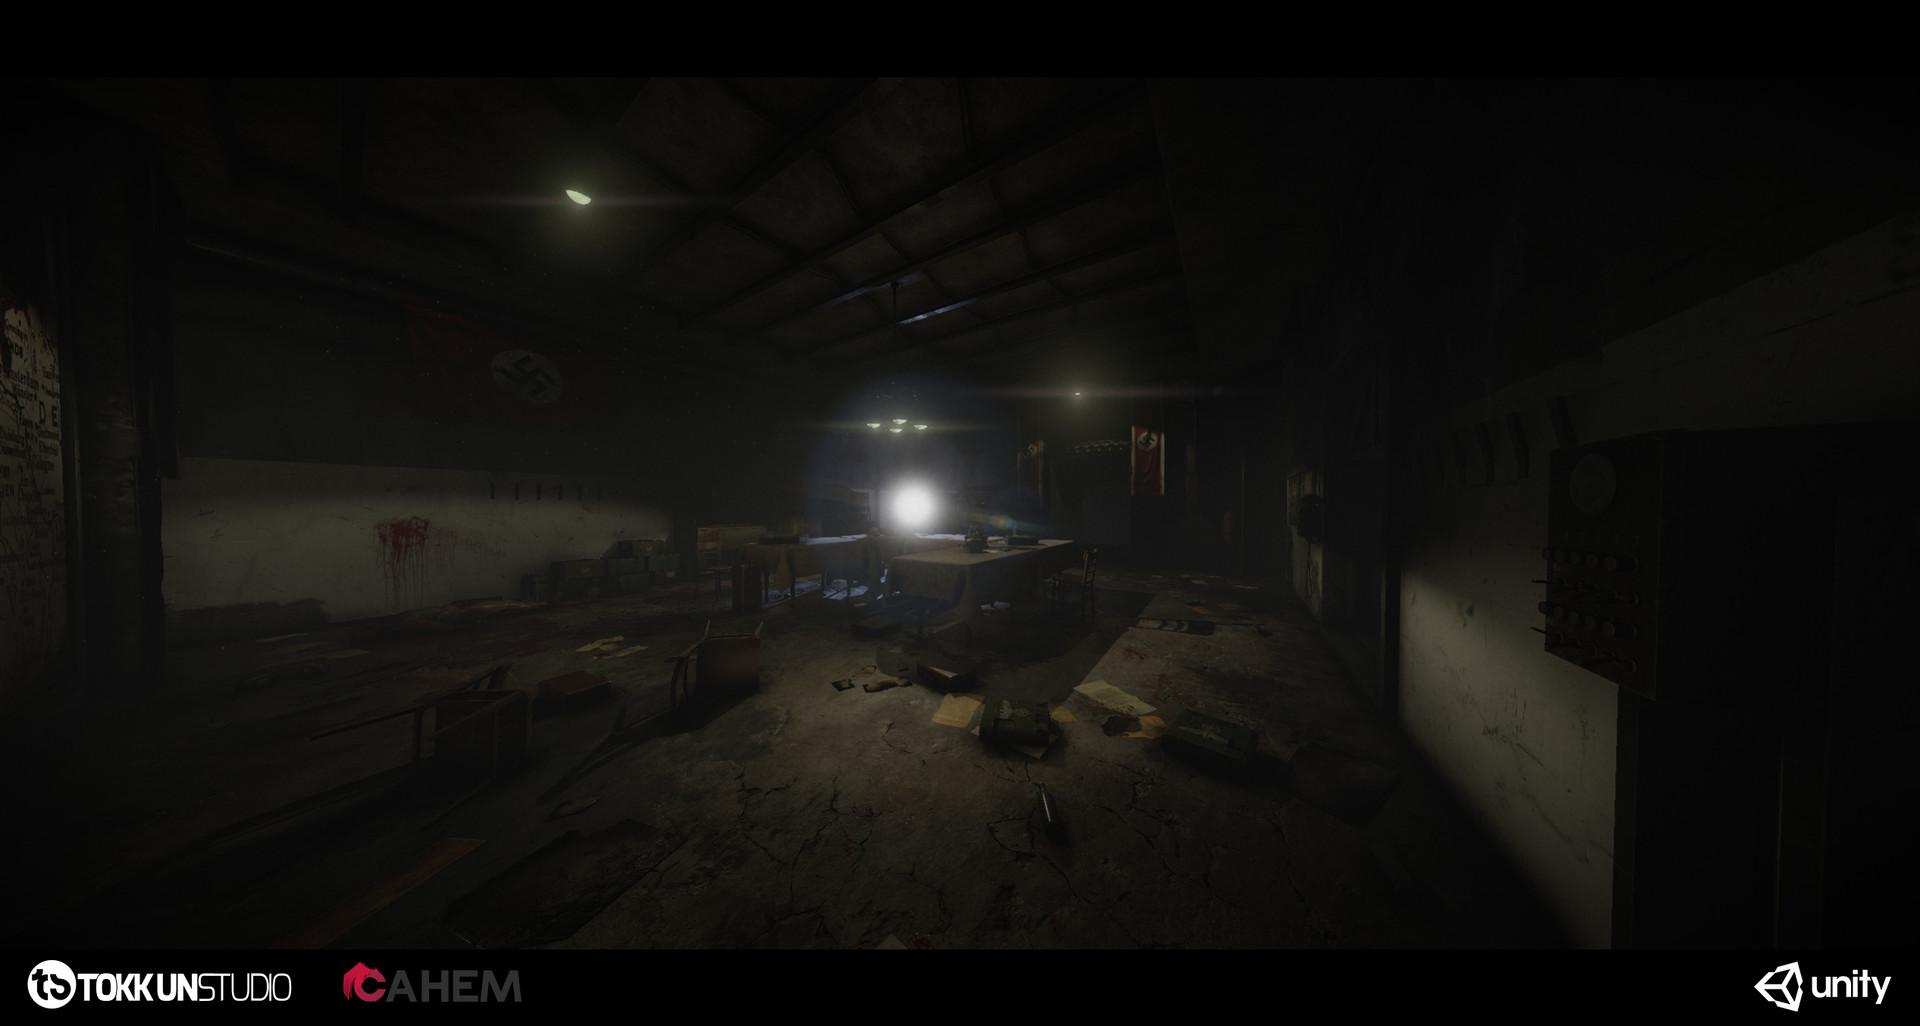 Tokkun studio bunker shot 45